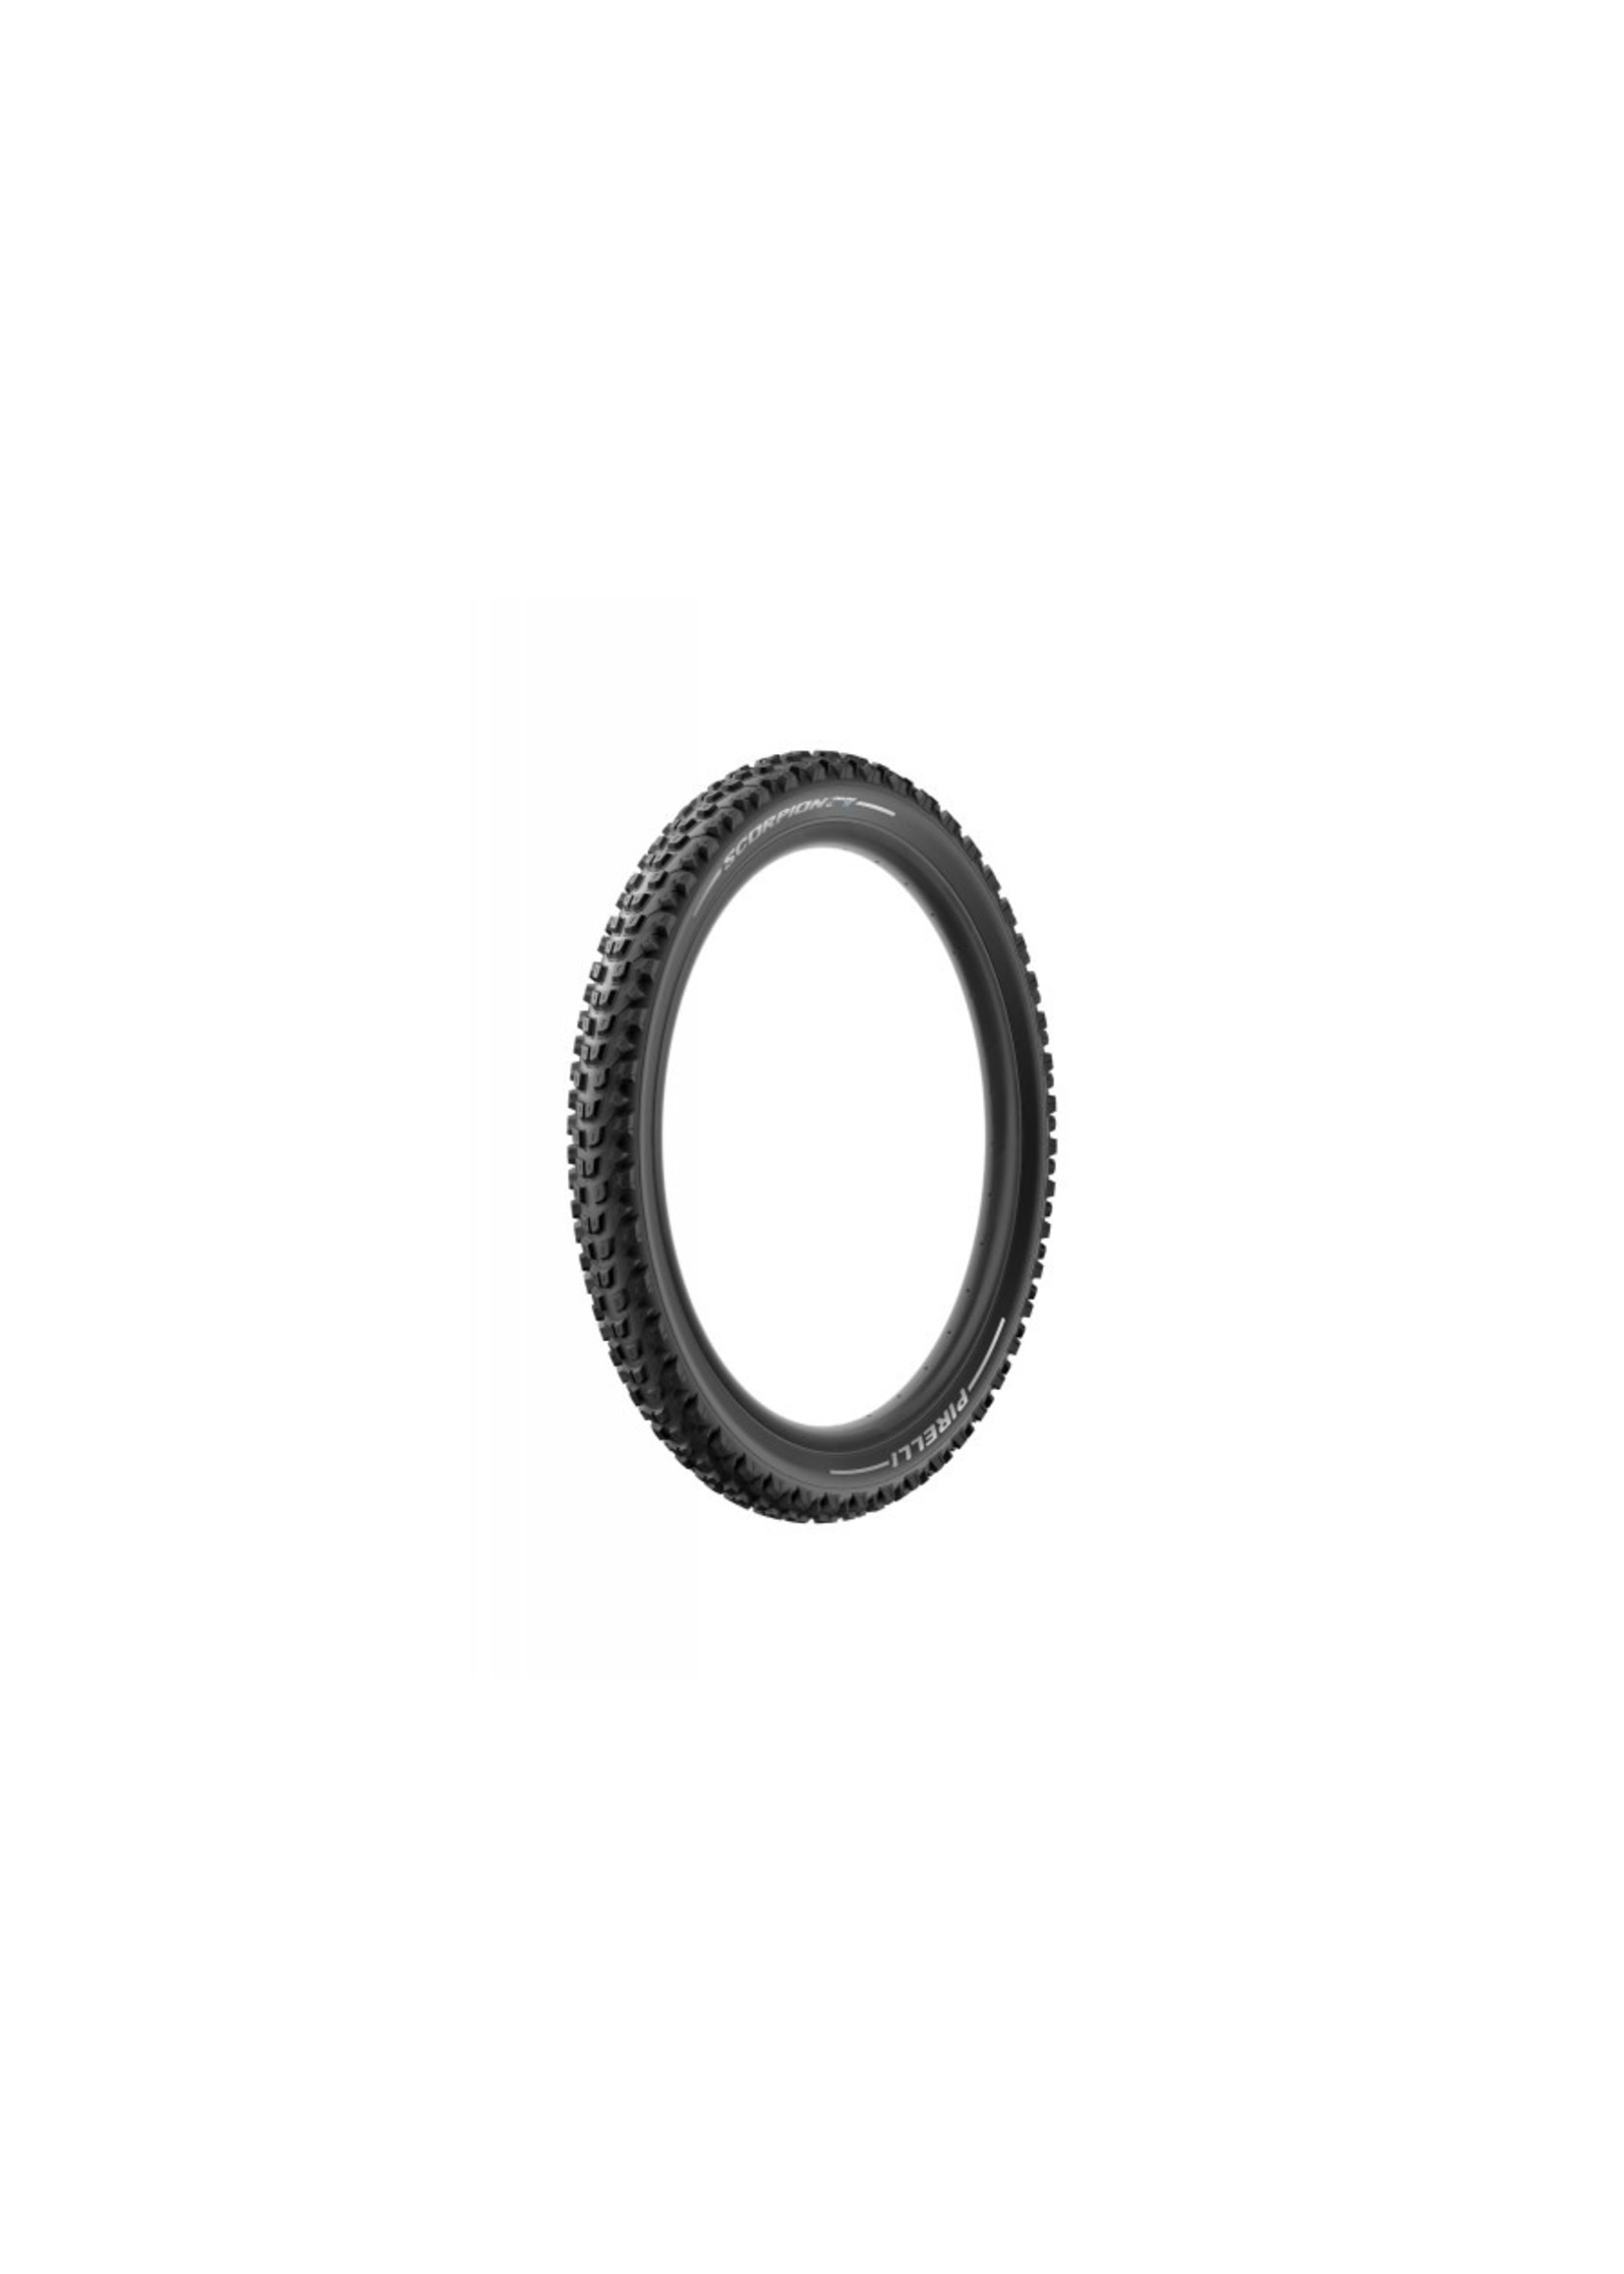 "Pirelli Pirelli Scorpion Enduro S Black HardWall / 27.5""x2.60"" / 1,100g"